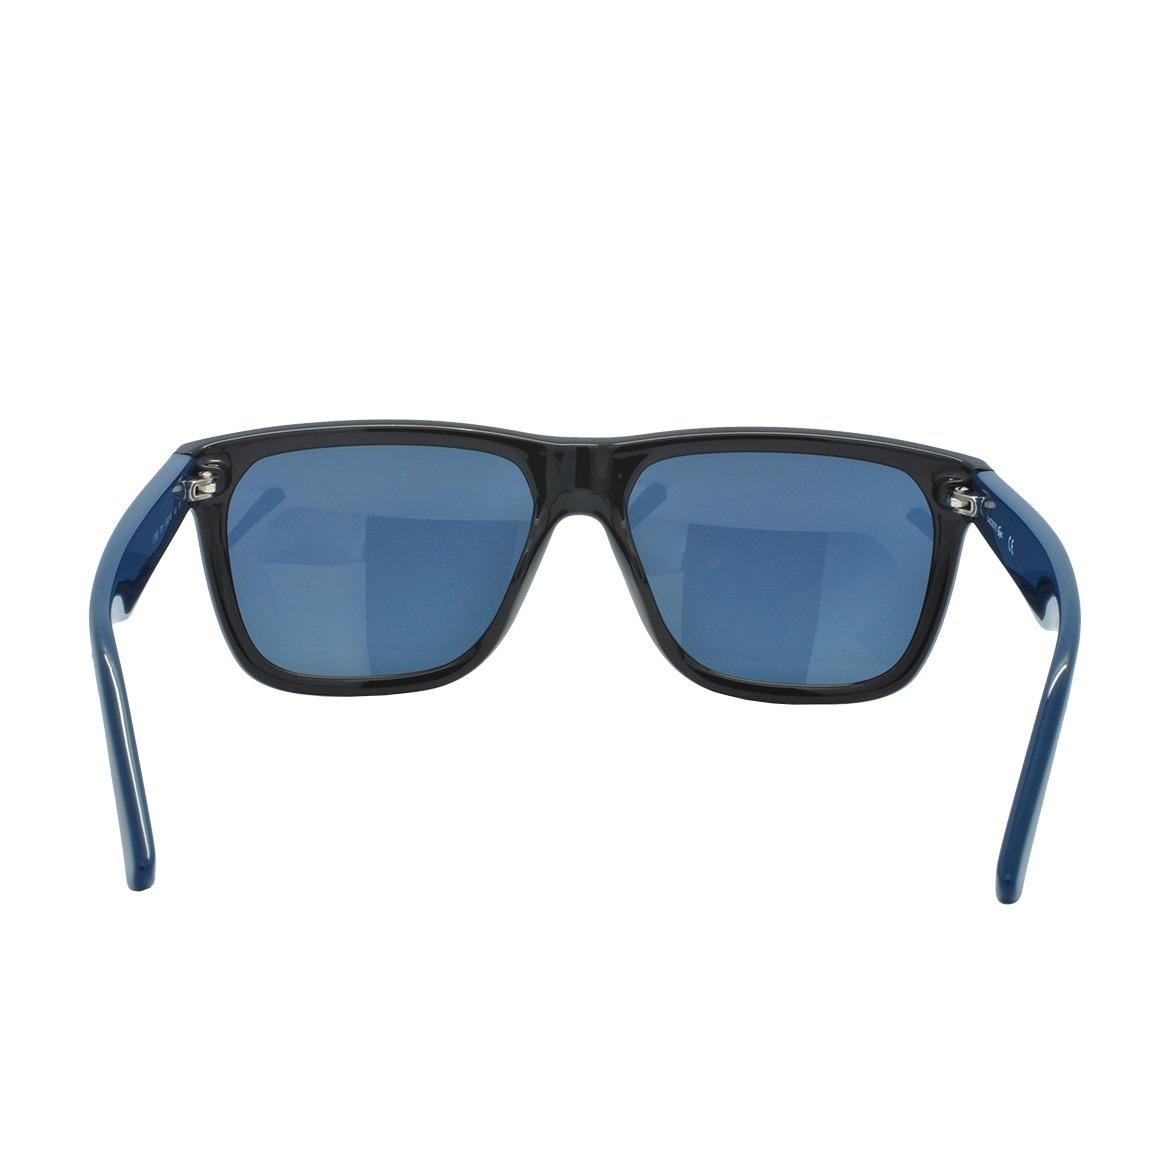 0c3d63a4070c7 óculos de sol lacoste original masculino l732s 001. Carregando zoom.